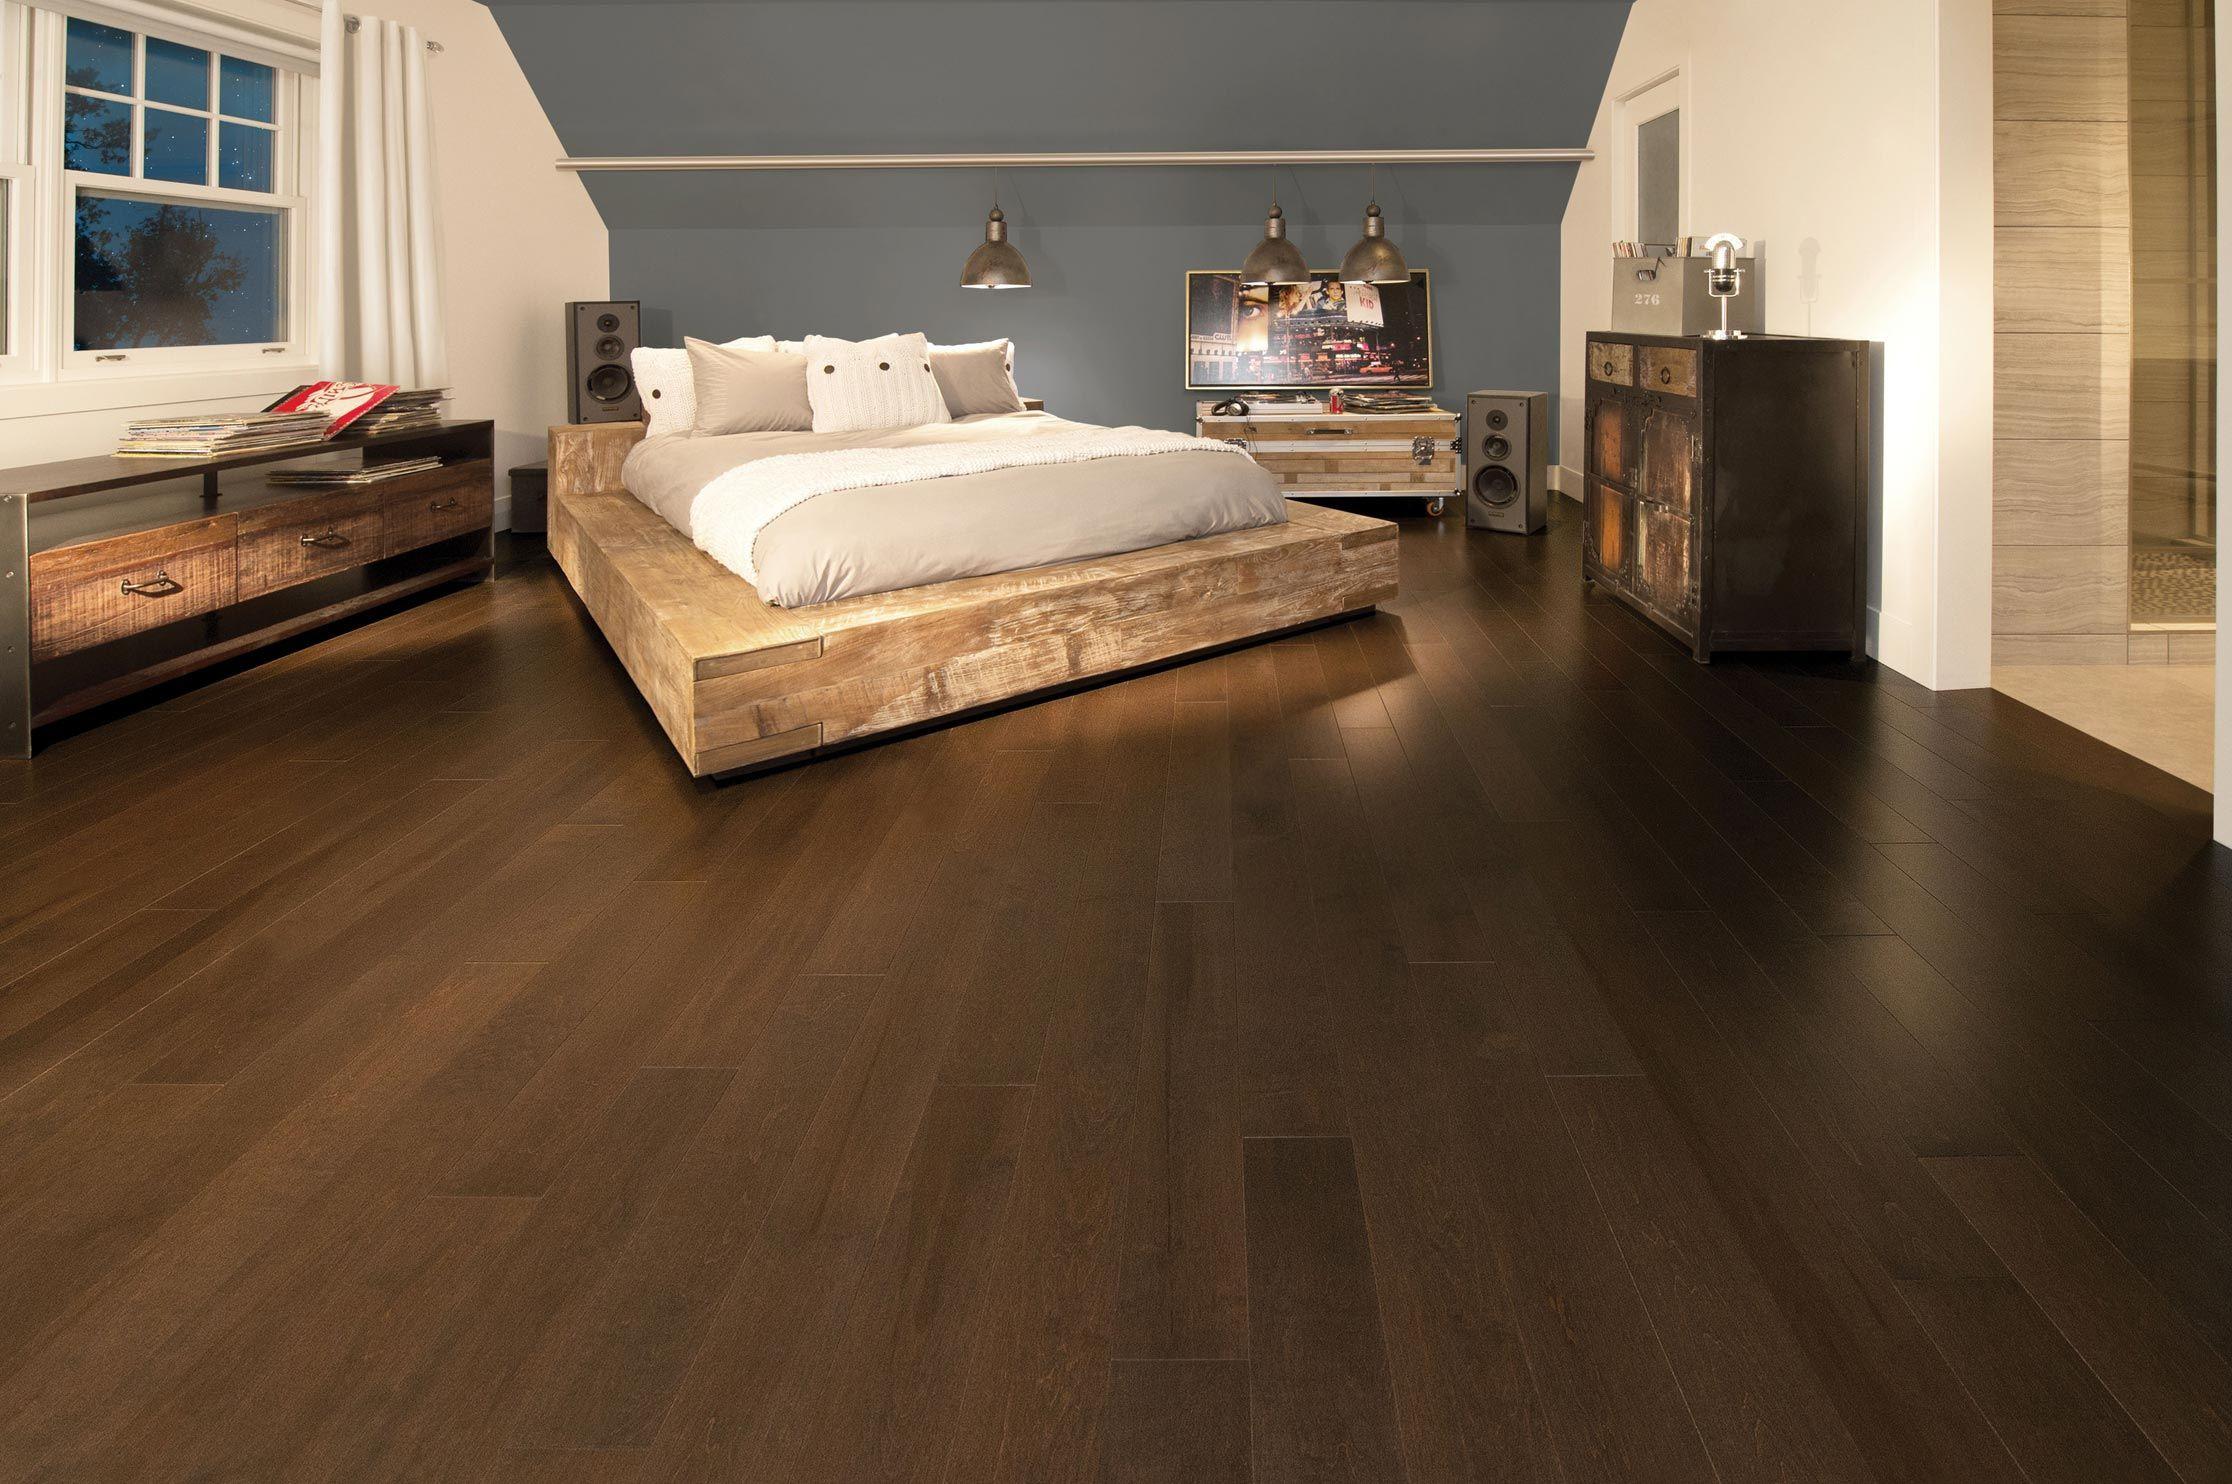 mohawk hardwood flooring dark auburn maple of subha muthukrishnan subham6 on pinterest with 69a2b4a9c72207ae73515f5ddf0aad47